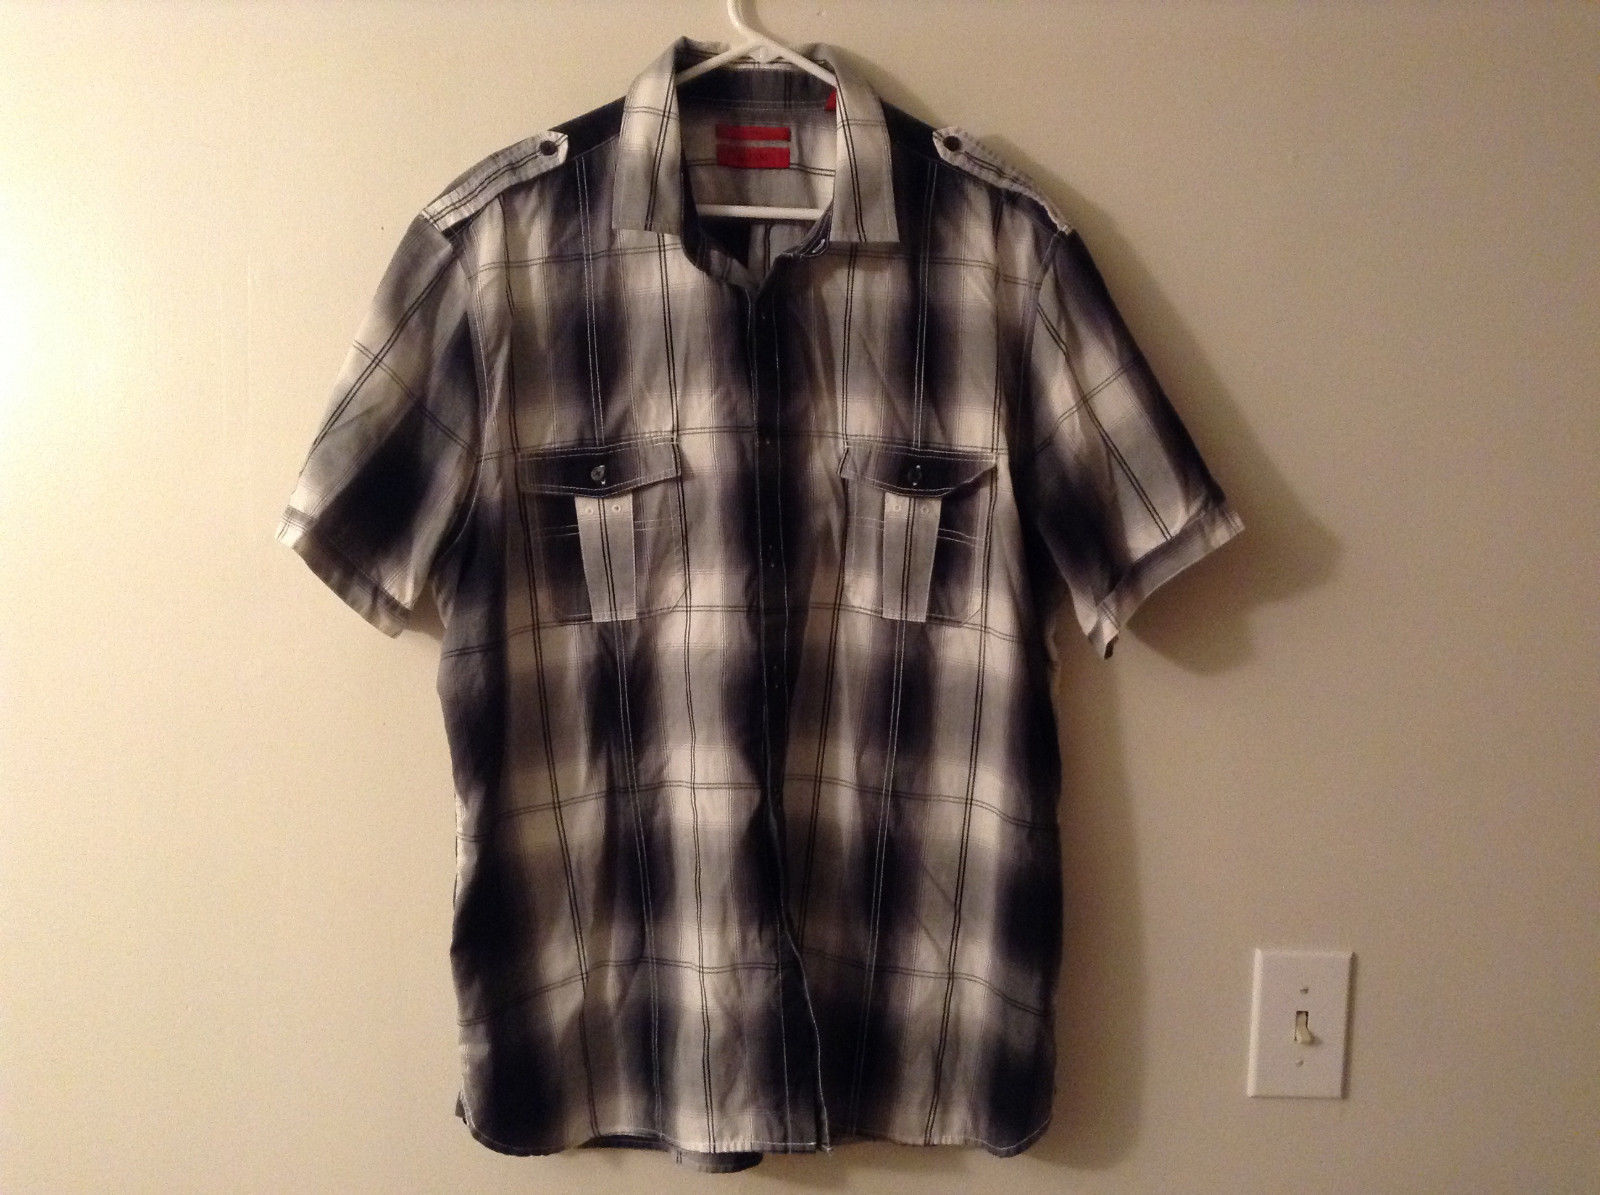 Alfani Men's Size 2XL XXL Button Down Shirt Short Sleeves Black & White Plaid